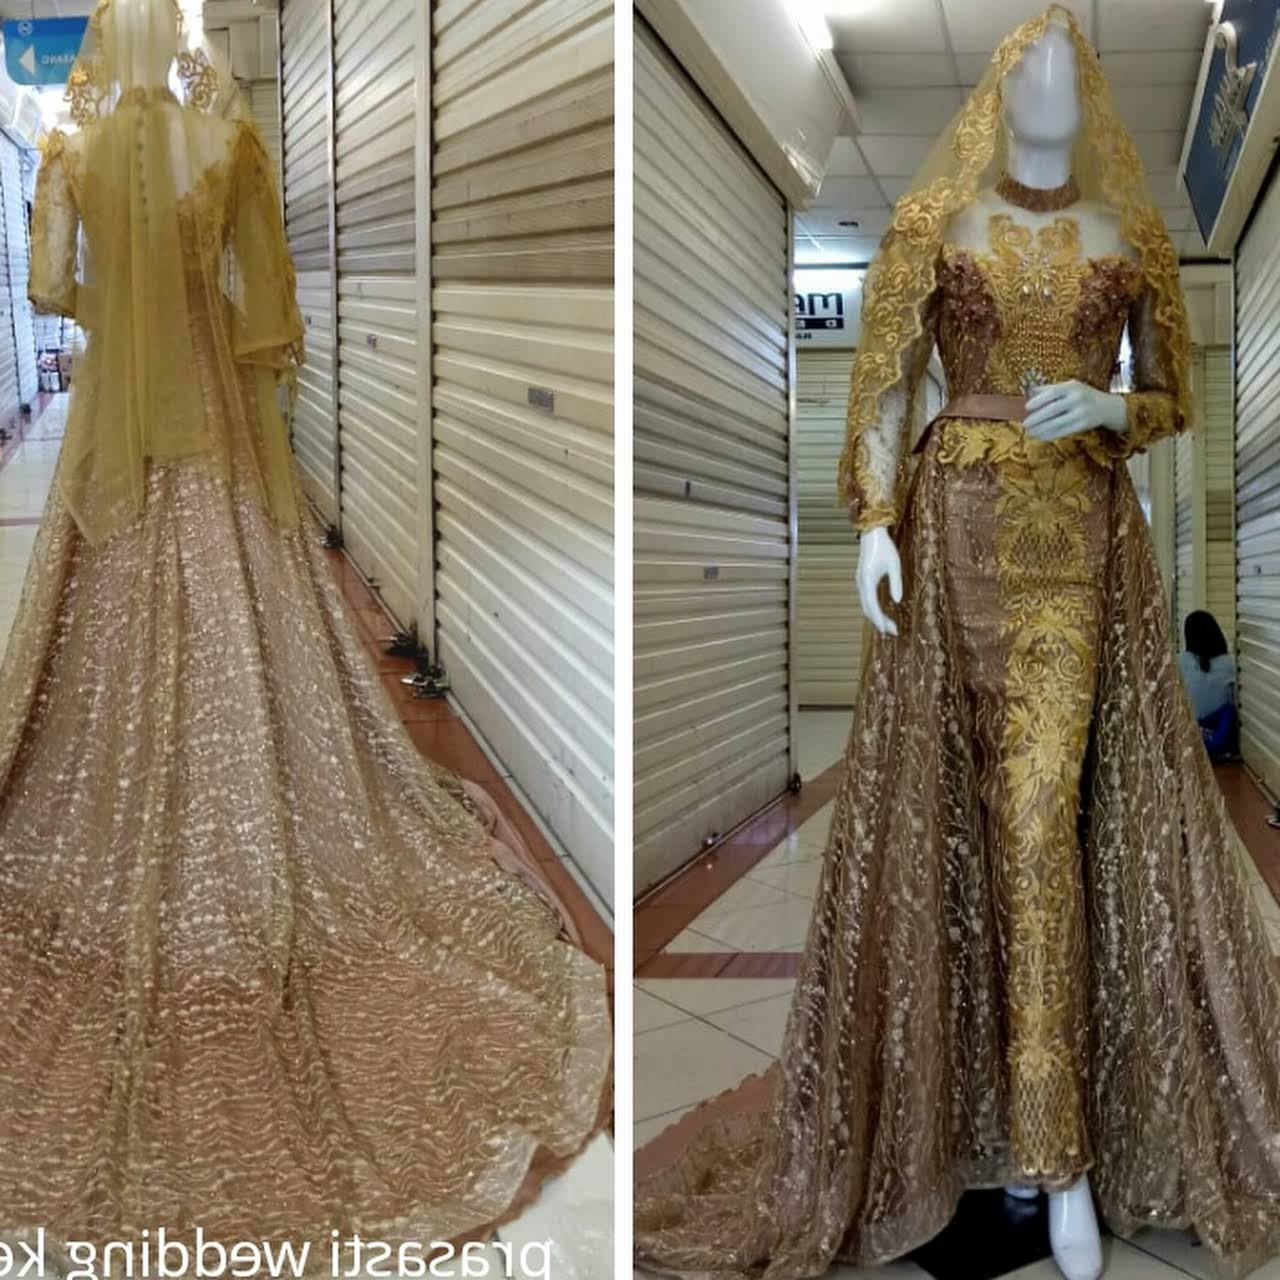 Bentuk Harga Sewa Gaun Pengantin Muslimah 0gdr Gaun Kebaya Pengantin Muslimah Hijab Syari Layanan Belanja